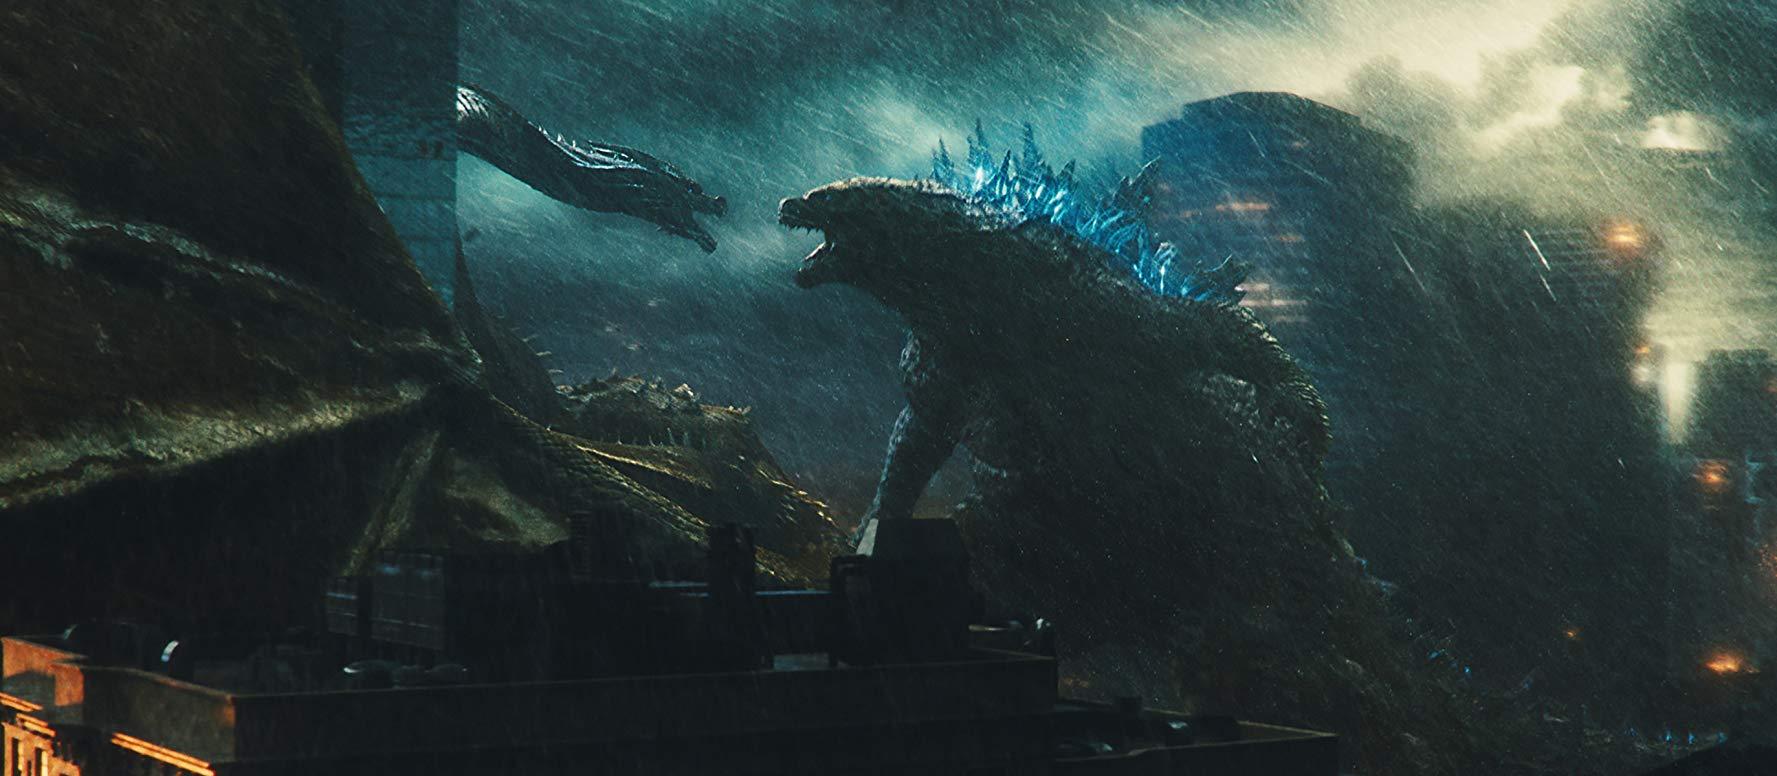 Godzilla II - King of the monster